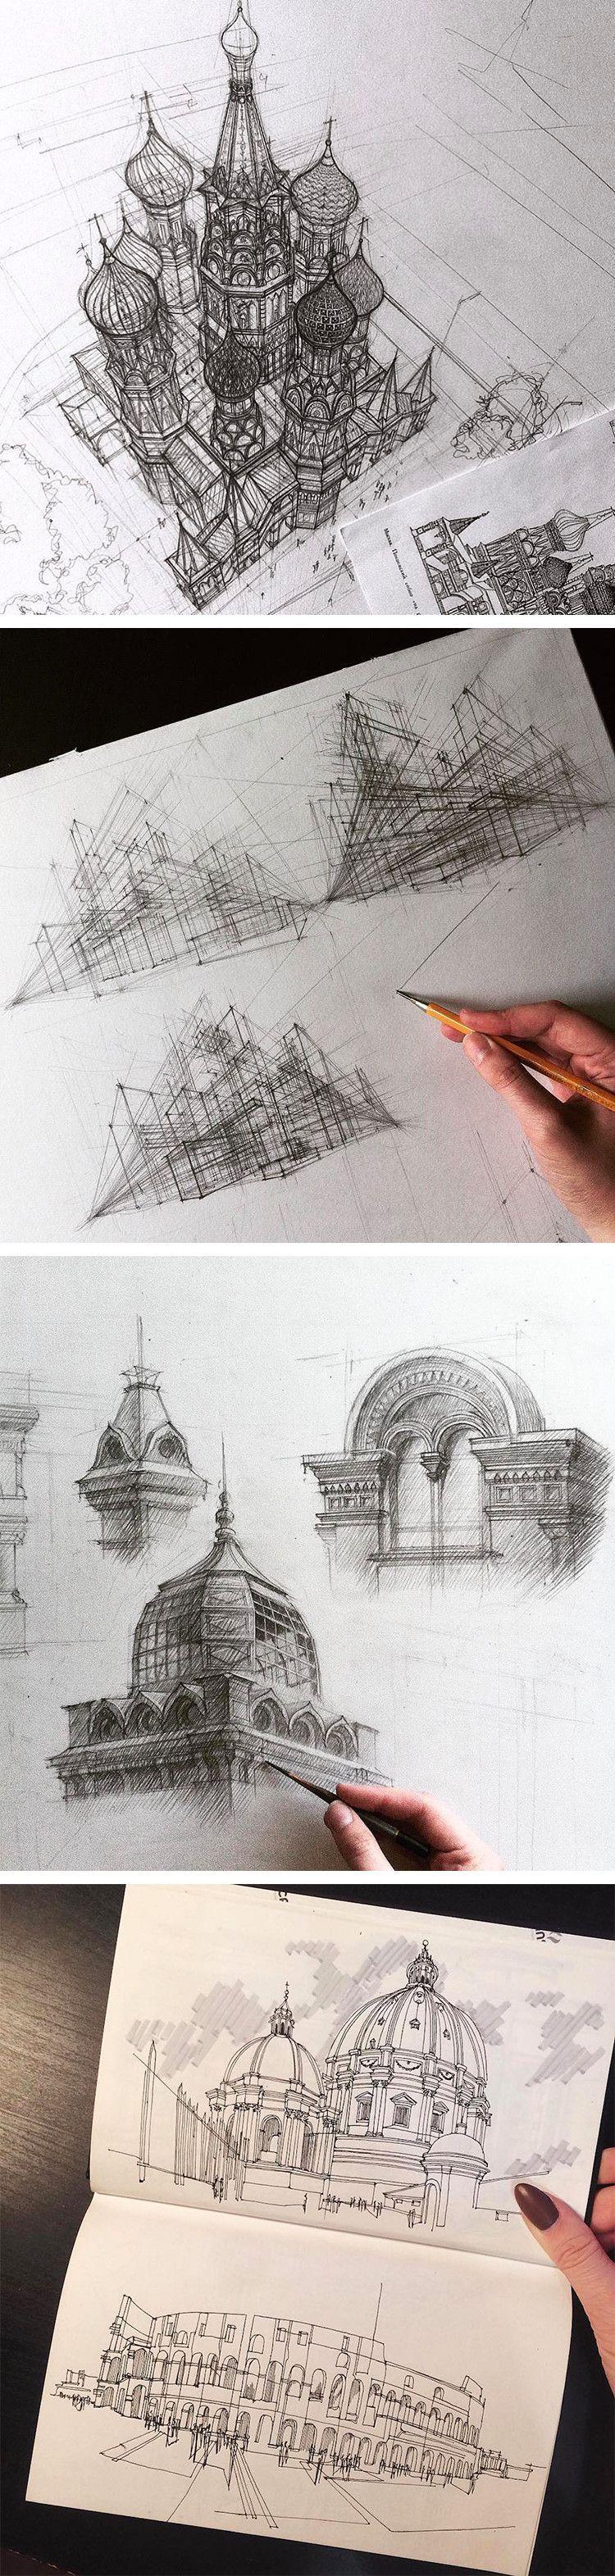 Hand Drawn Architectural Sketches By Adelina Gareeva Veshestva